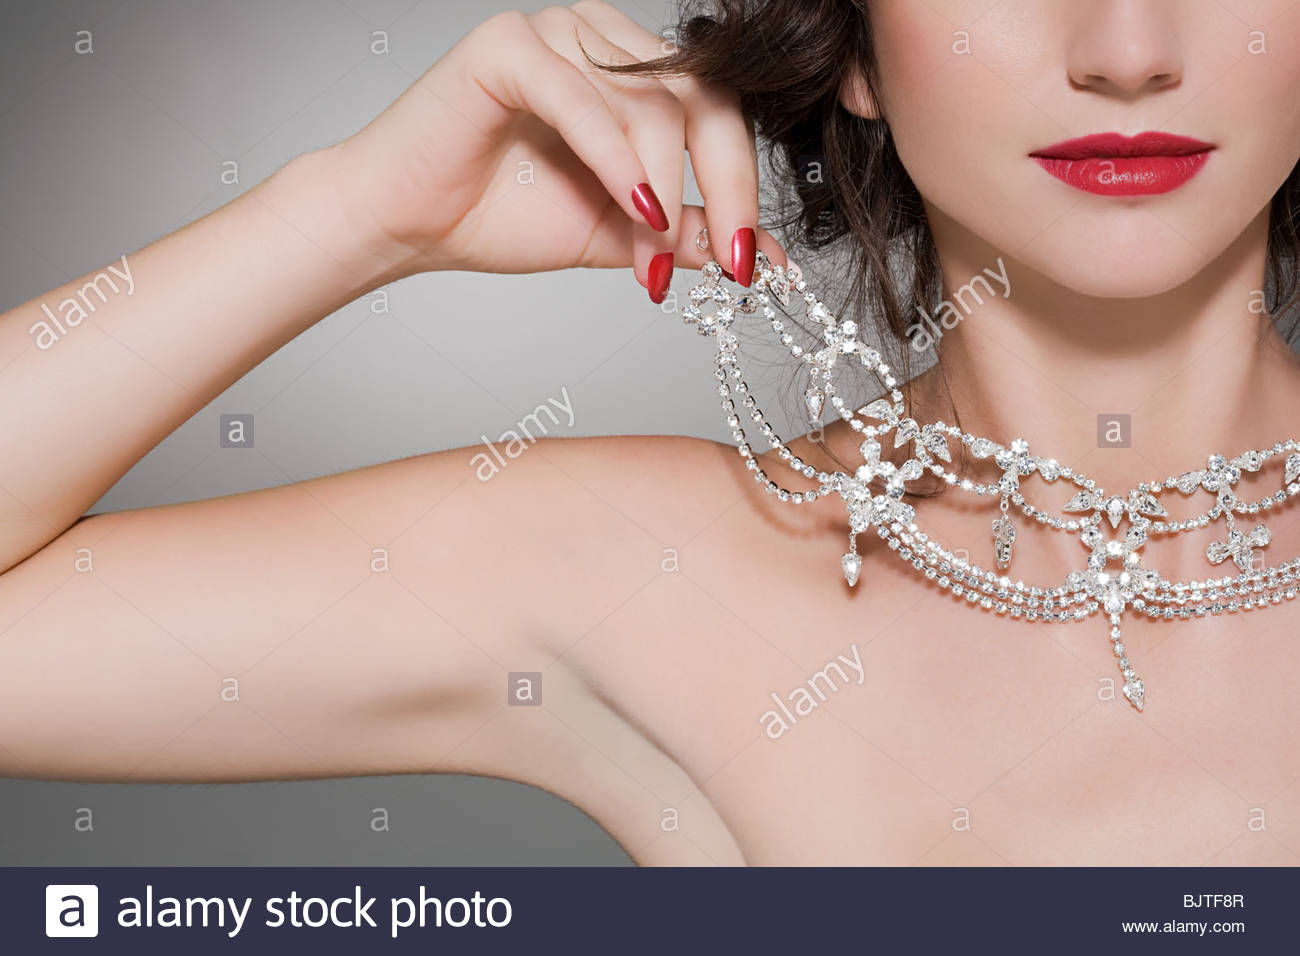 Lady Rich Stockfotos & Lady Rich Bilder - Seite 3 - Alamy